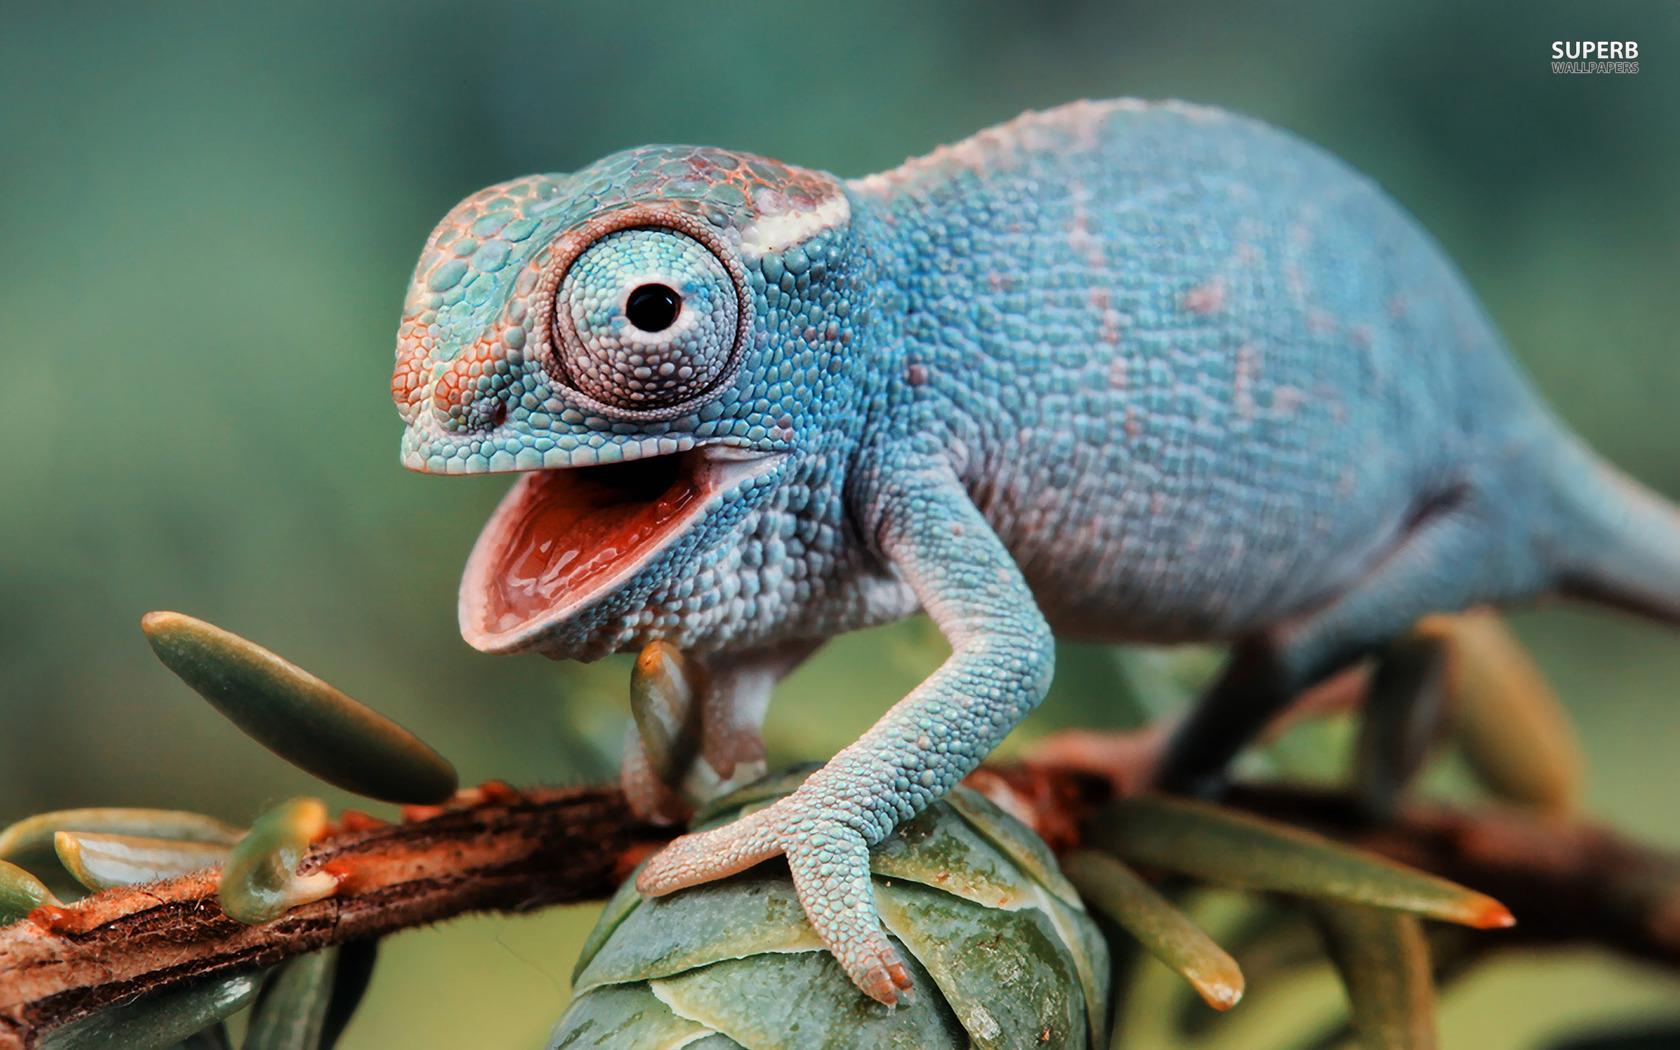 Cute Chameleon Wallpaper 23640 1920x1080 px